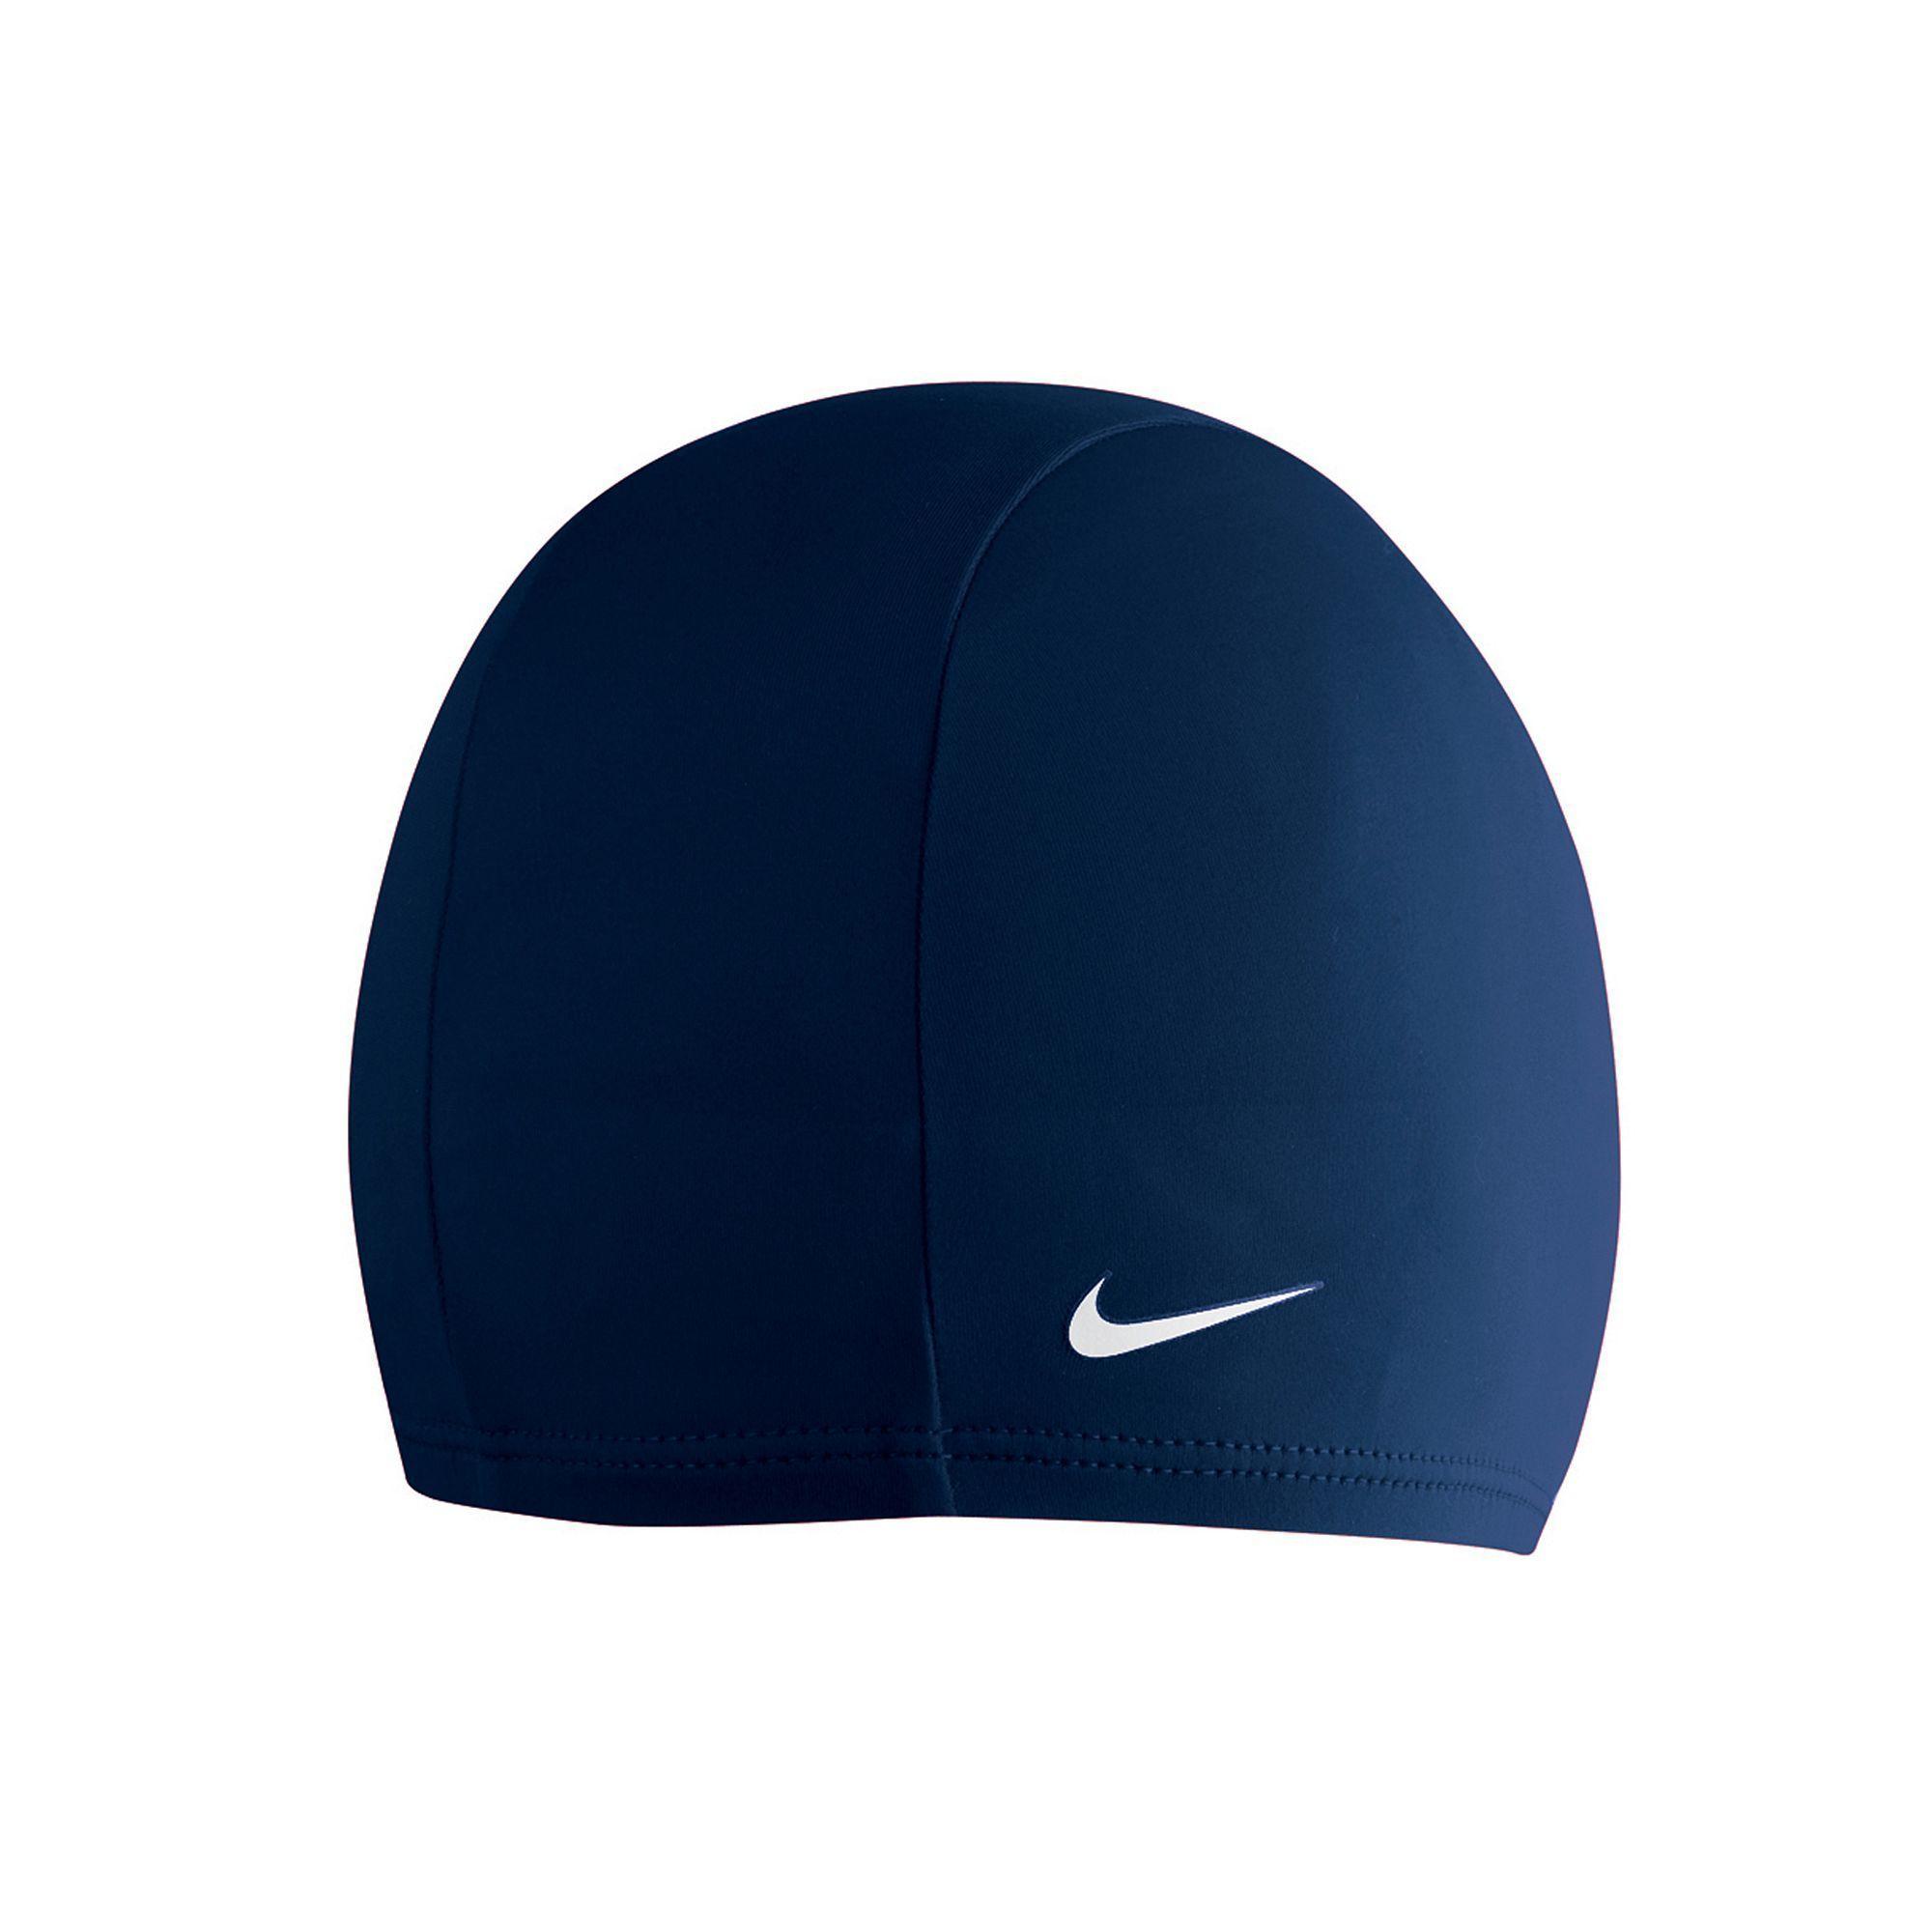 8b62c7a70bc Nike Swim Cap | Products | Swim caps, Swimming, Nike